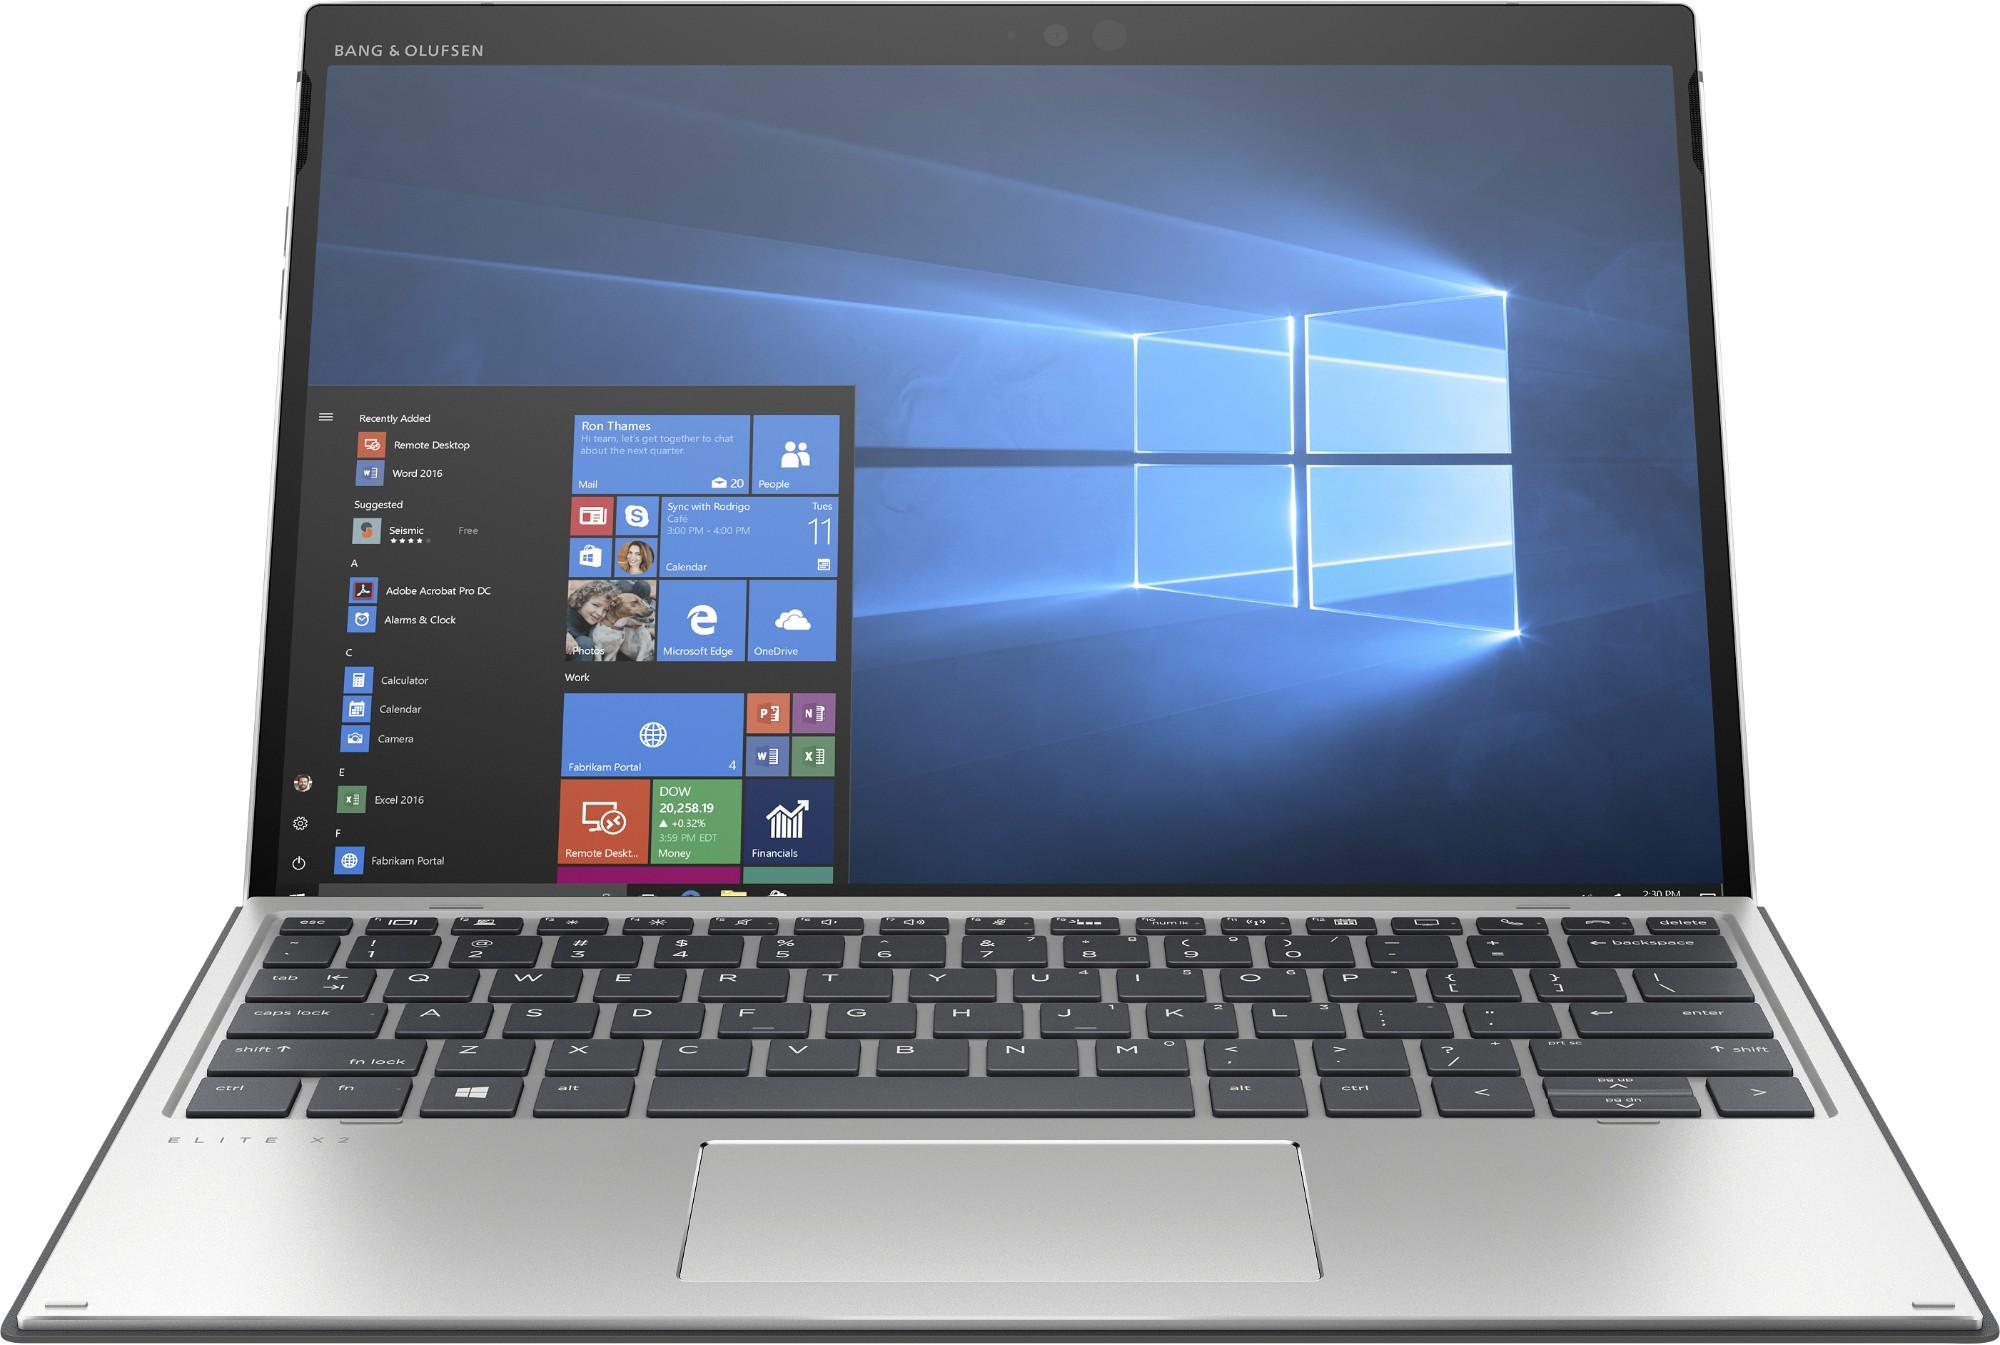 "HP Elite x2 G4 Zilver Hybride (2-in-1) 31,2 cm (12.3"") 1920 x 1280 Pixels Touchscreen Dual-screen Intel® 8ste generatie Core™ i5 i5-8265U 8 GB LPDDR3-SDRAM 256 GB SSD"